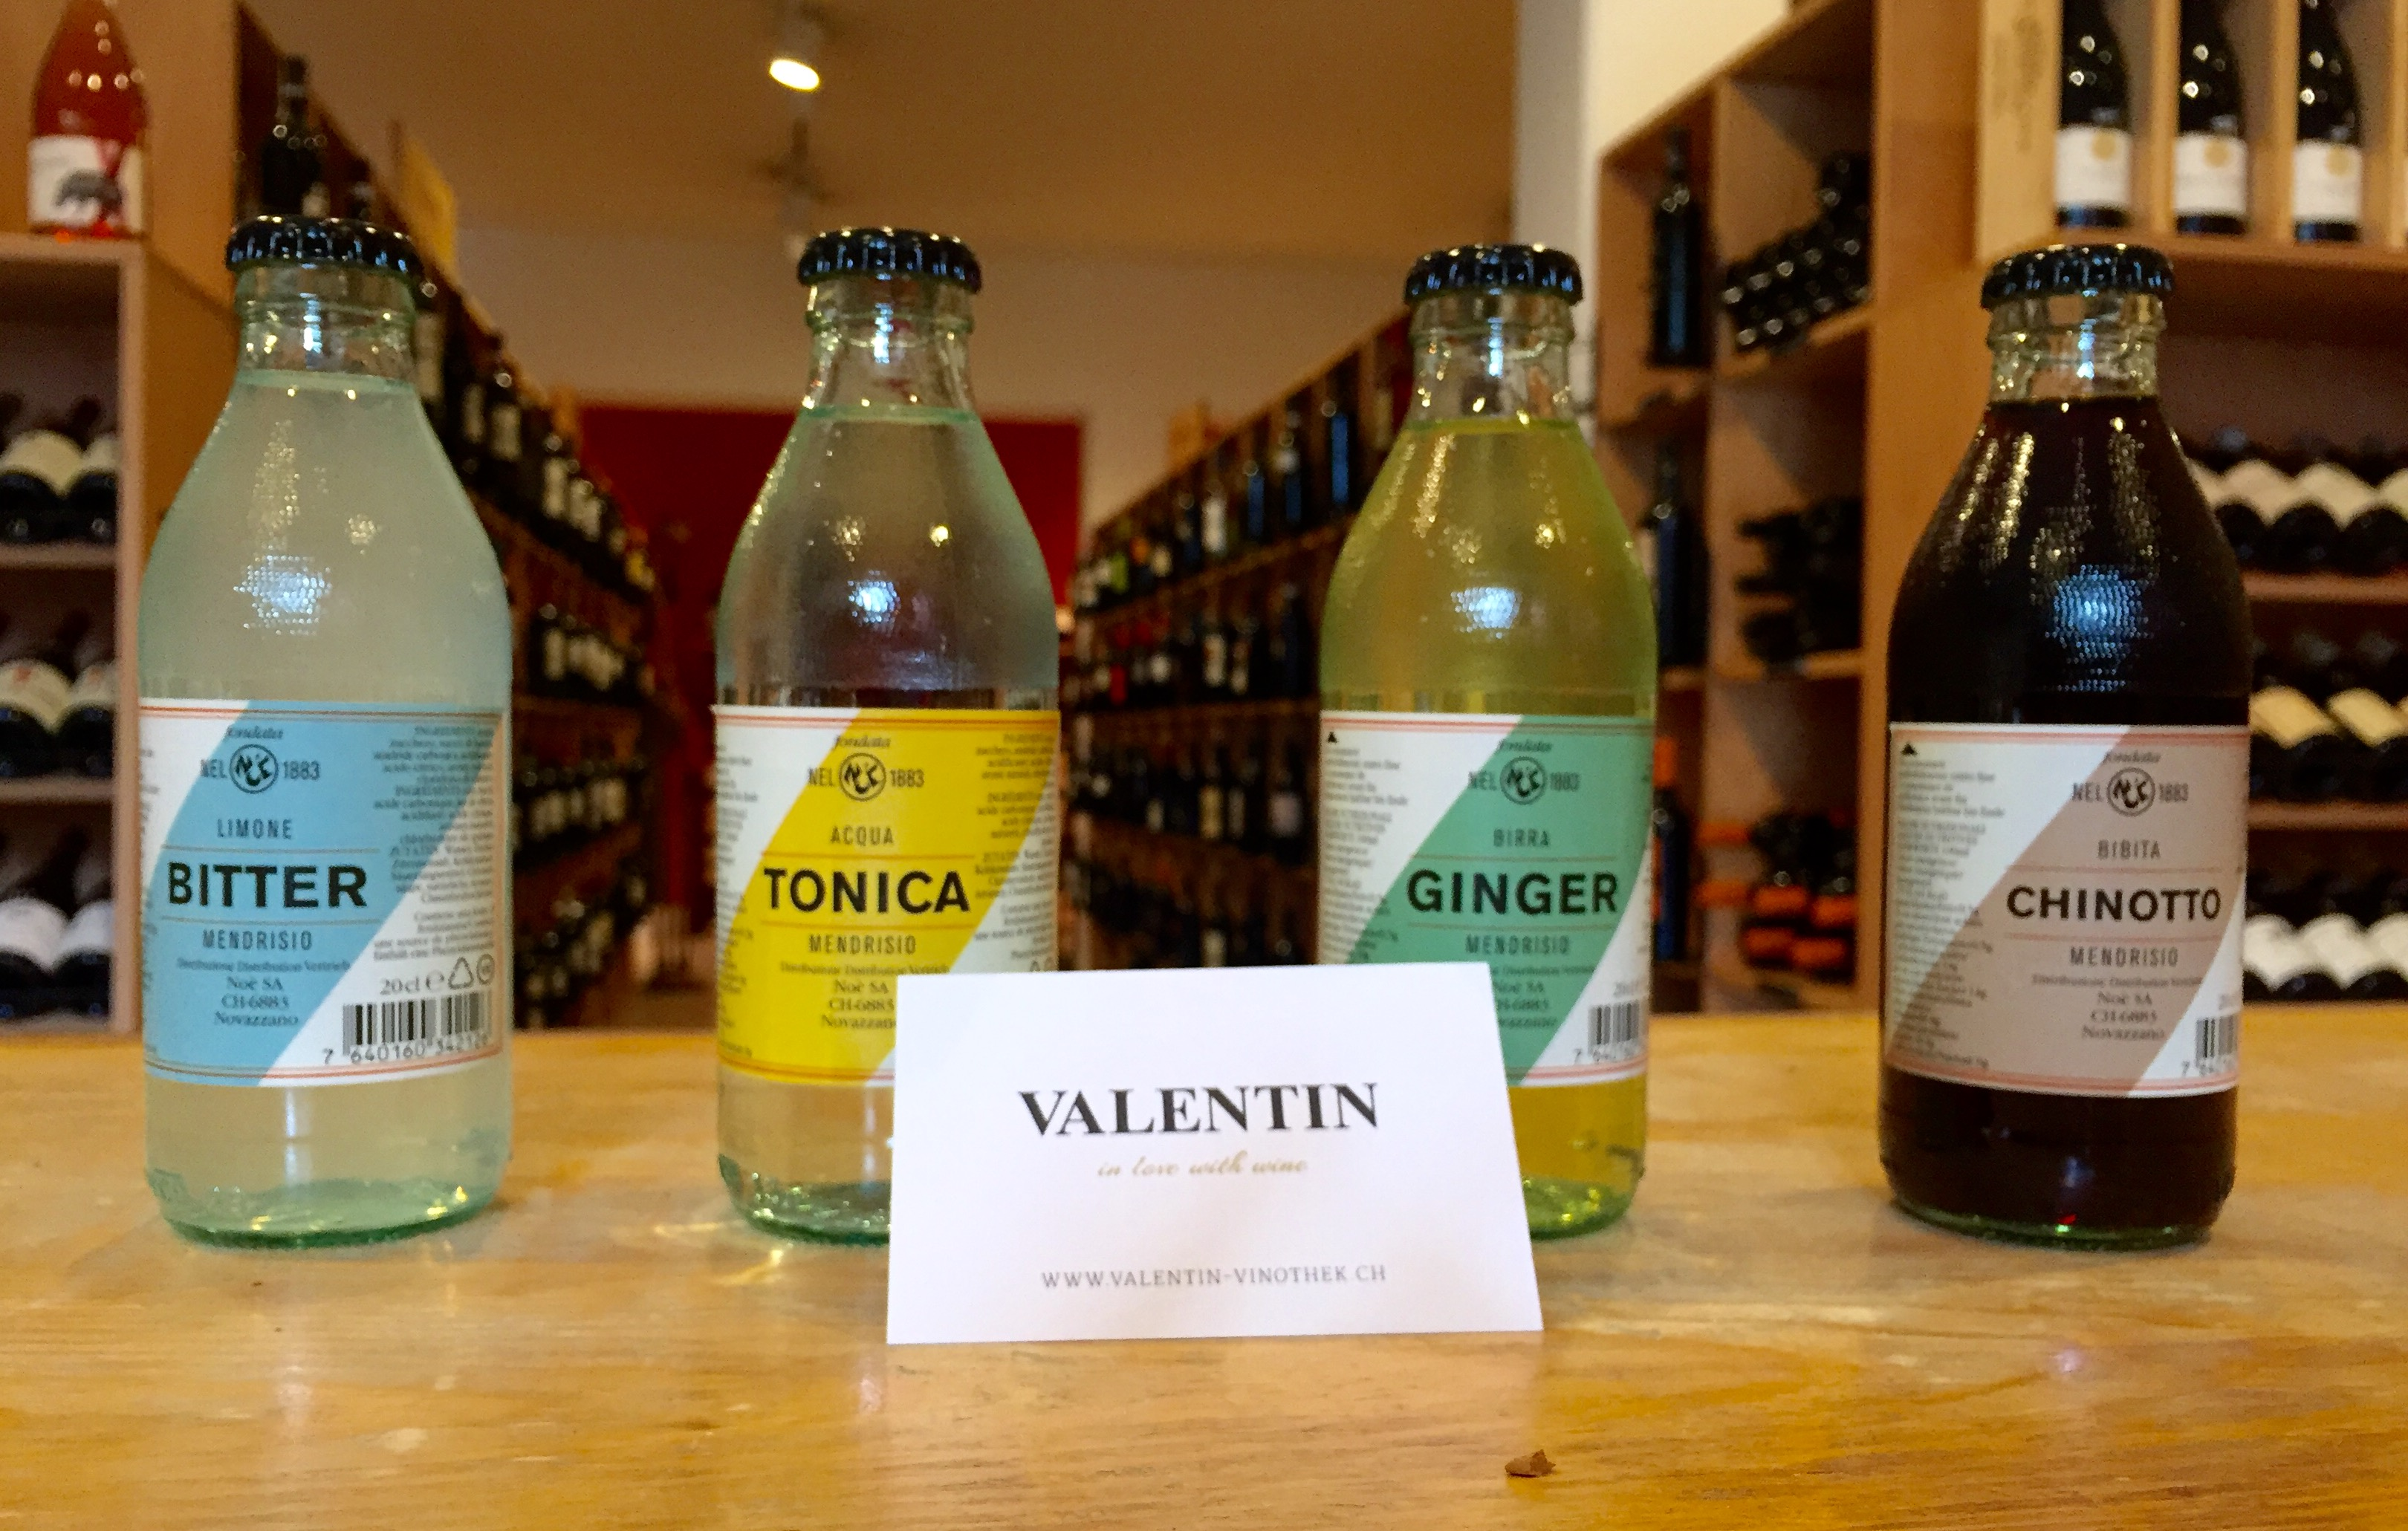 Valentin Wine St. Moritz